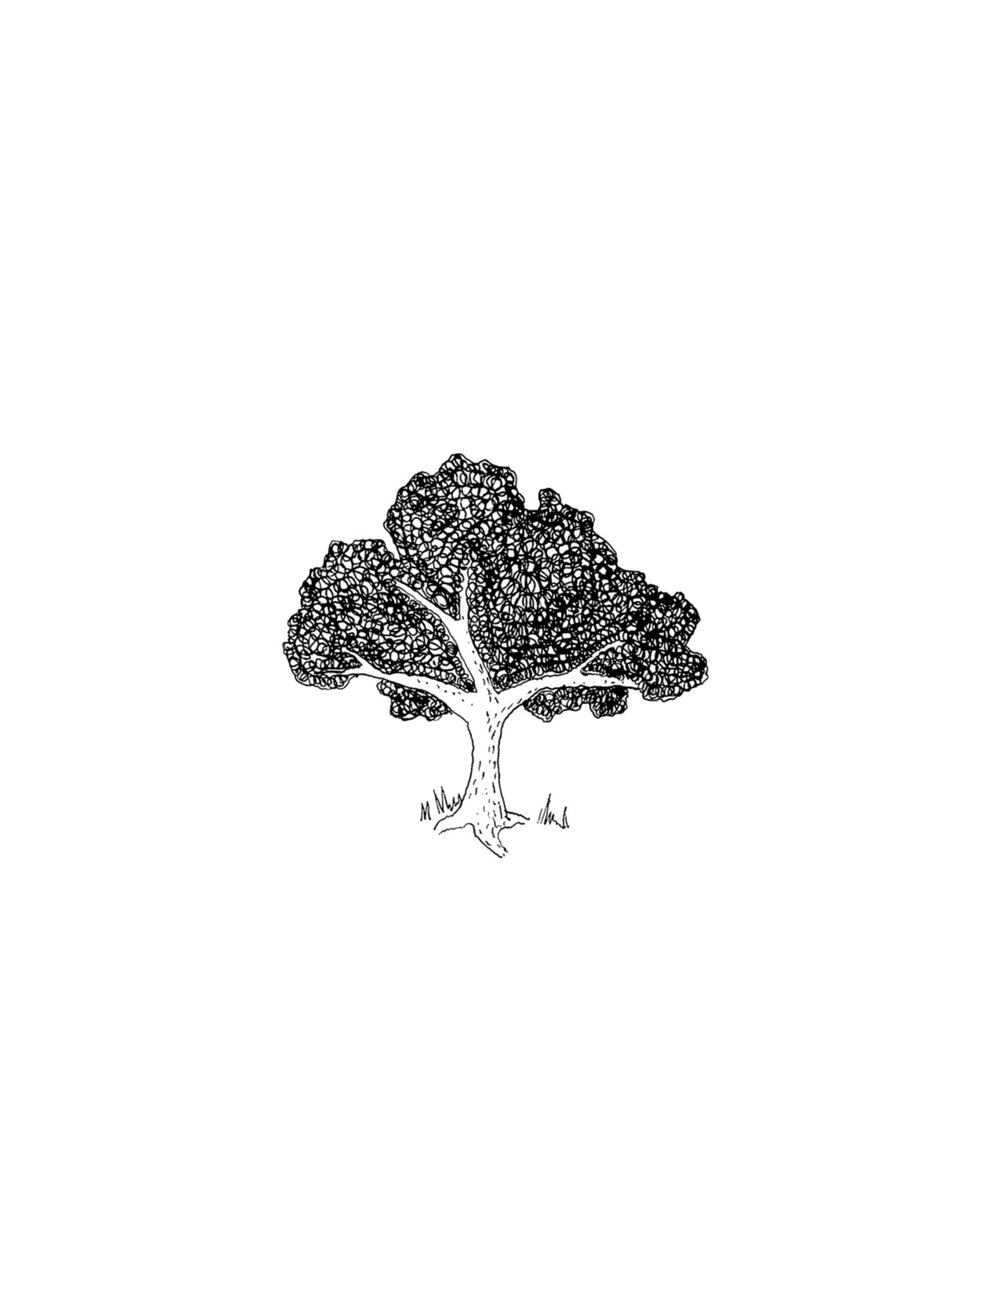 hudson-valley-farm-weddings-pioneer-farm-weddings-warwick-ny-Tree.jpg